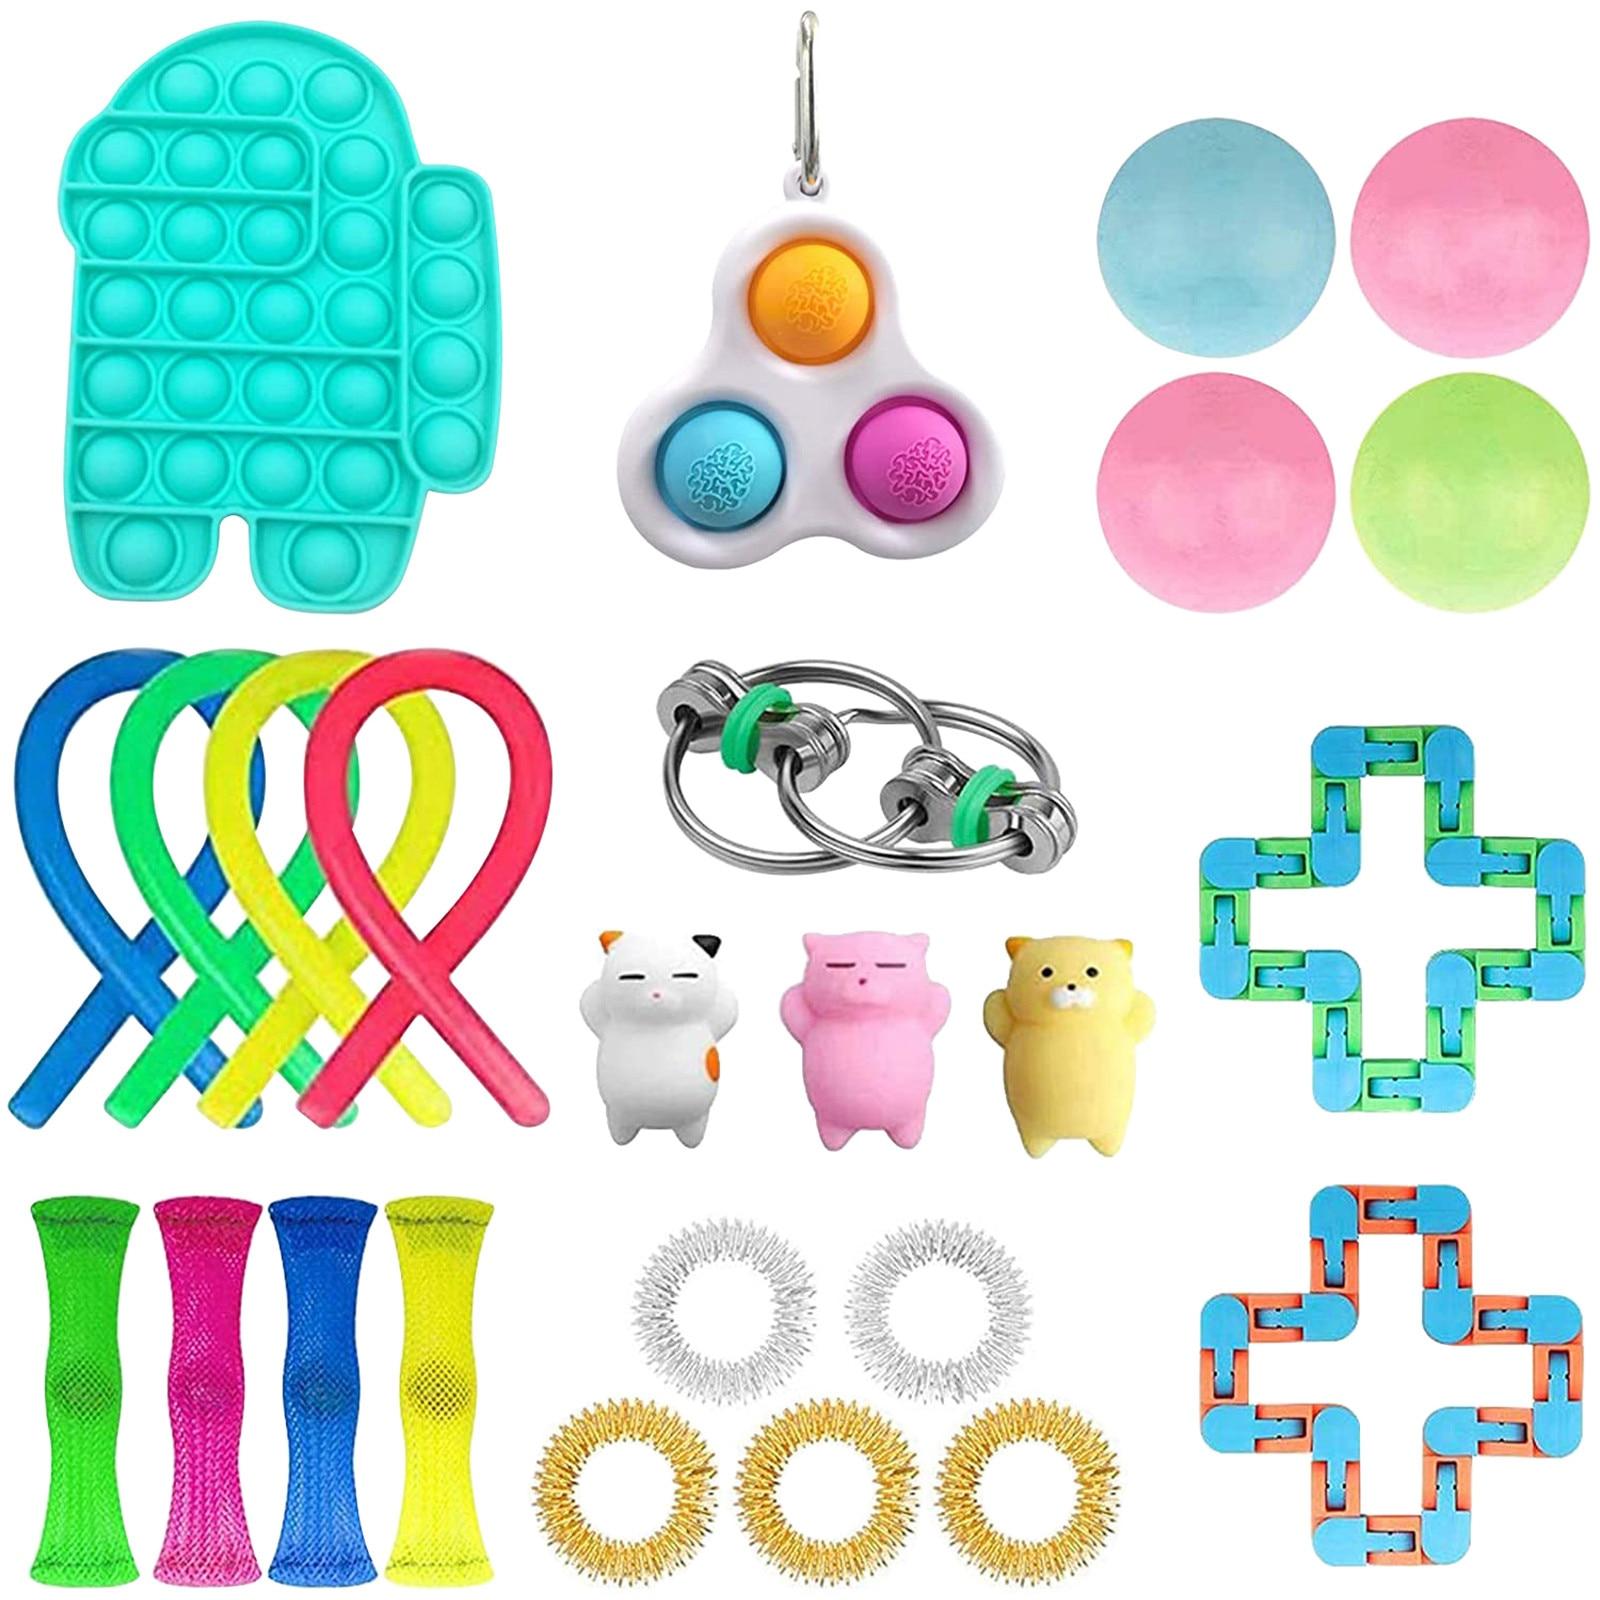 29/25Pcs Fidget Toy Set Cheap Sensory Fidget Toys Pack for Kids or Adults Decompression img2